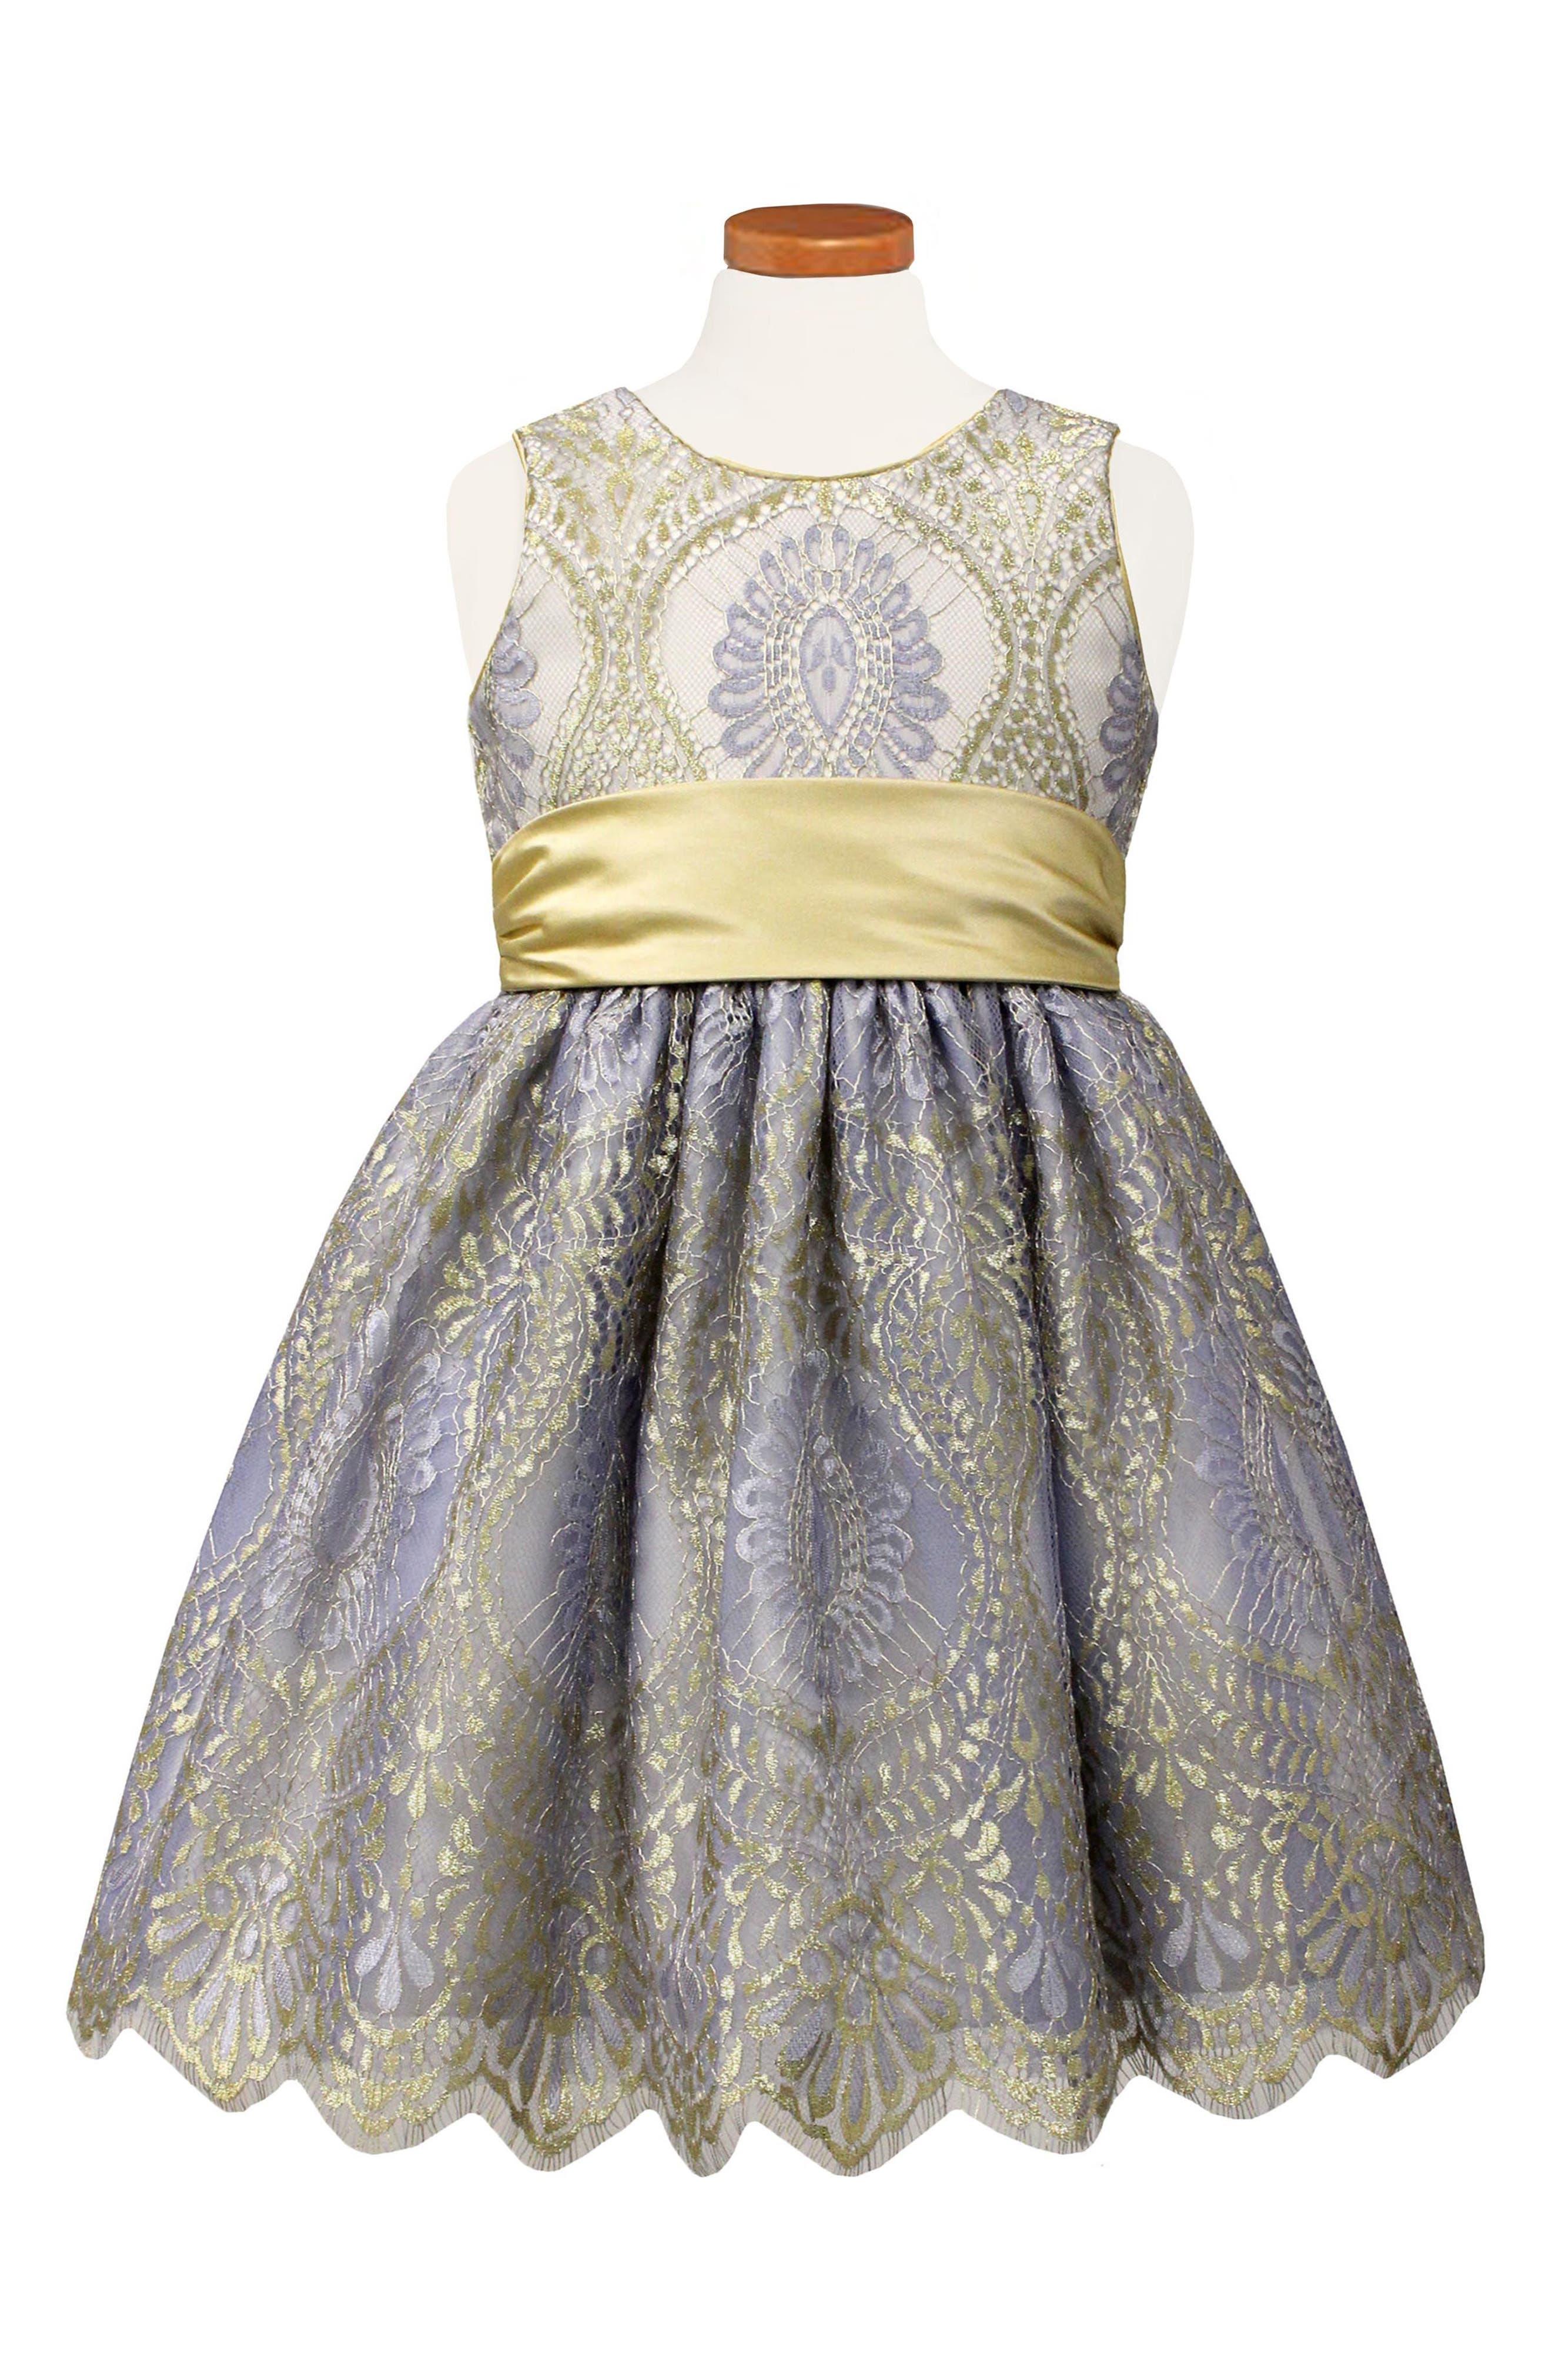 SORBET Lace Party Dress